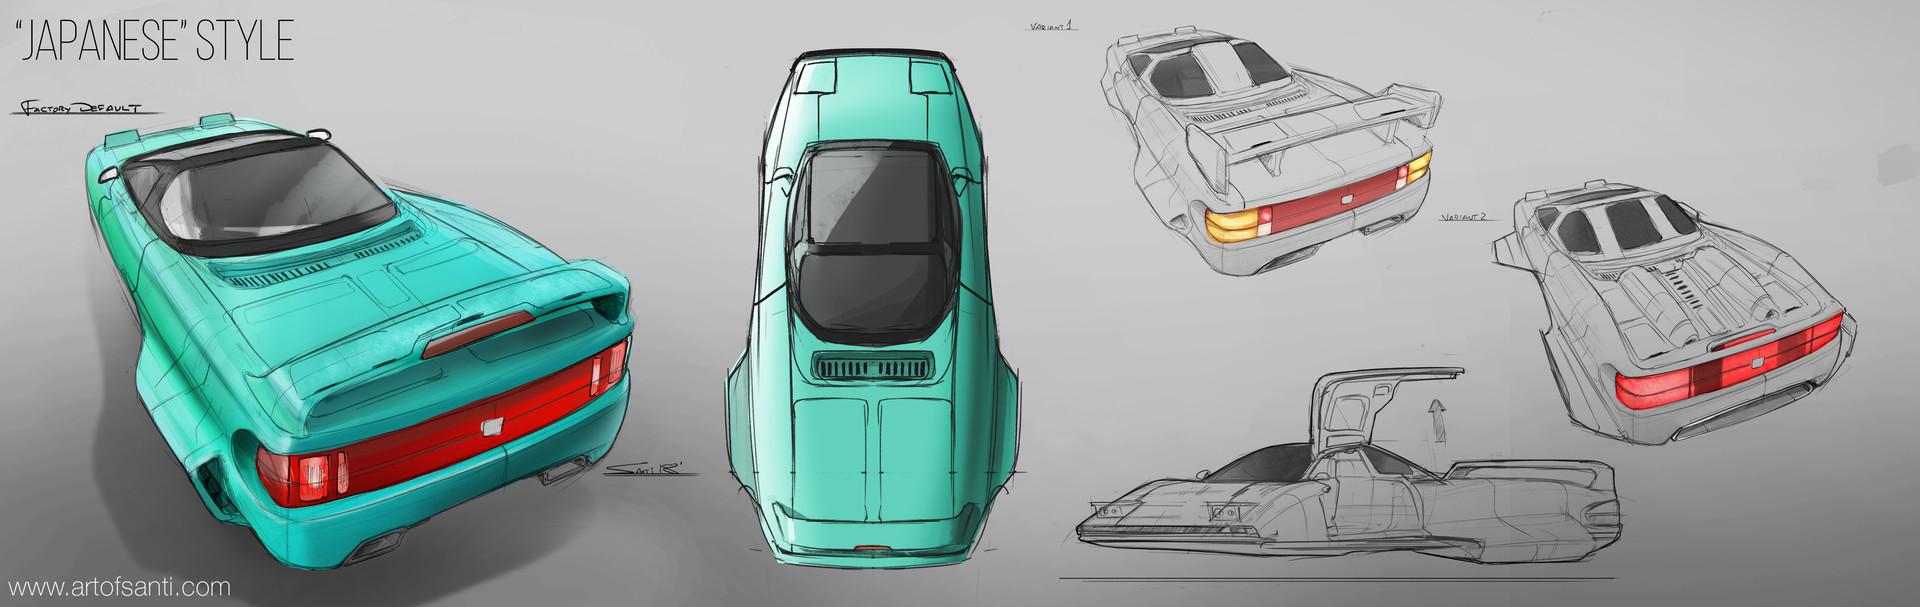 Santiago fuentes spaceracer vehicles concept v001b santiagofuentesjapanese style